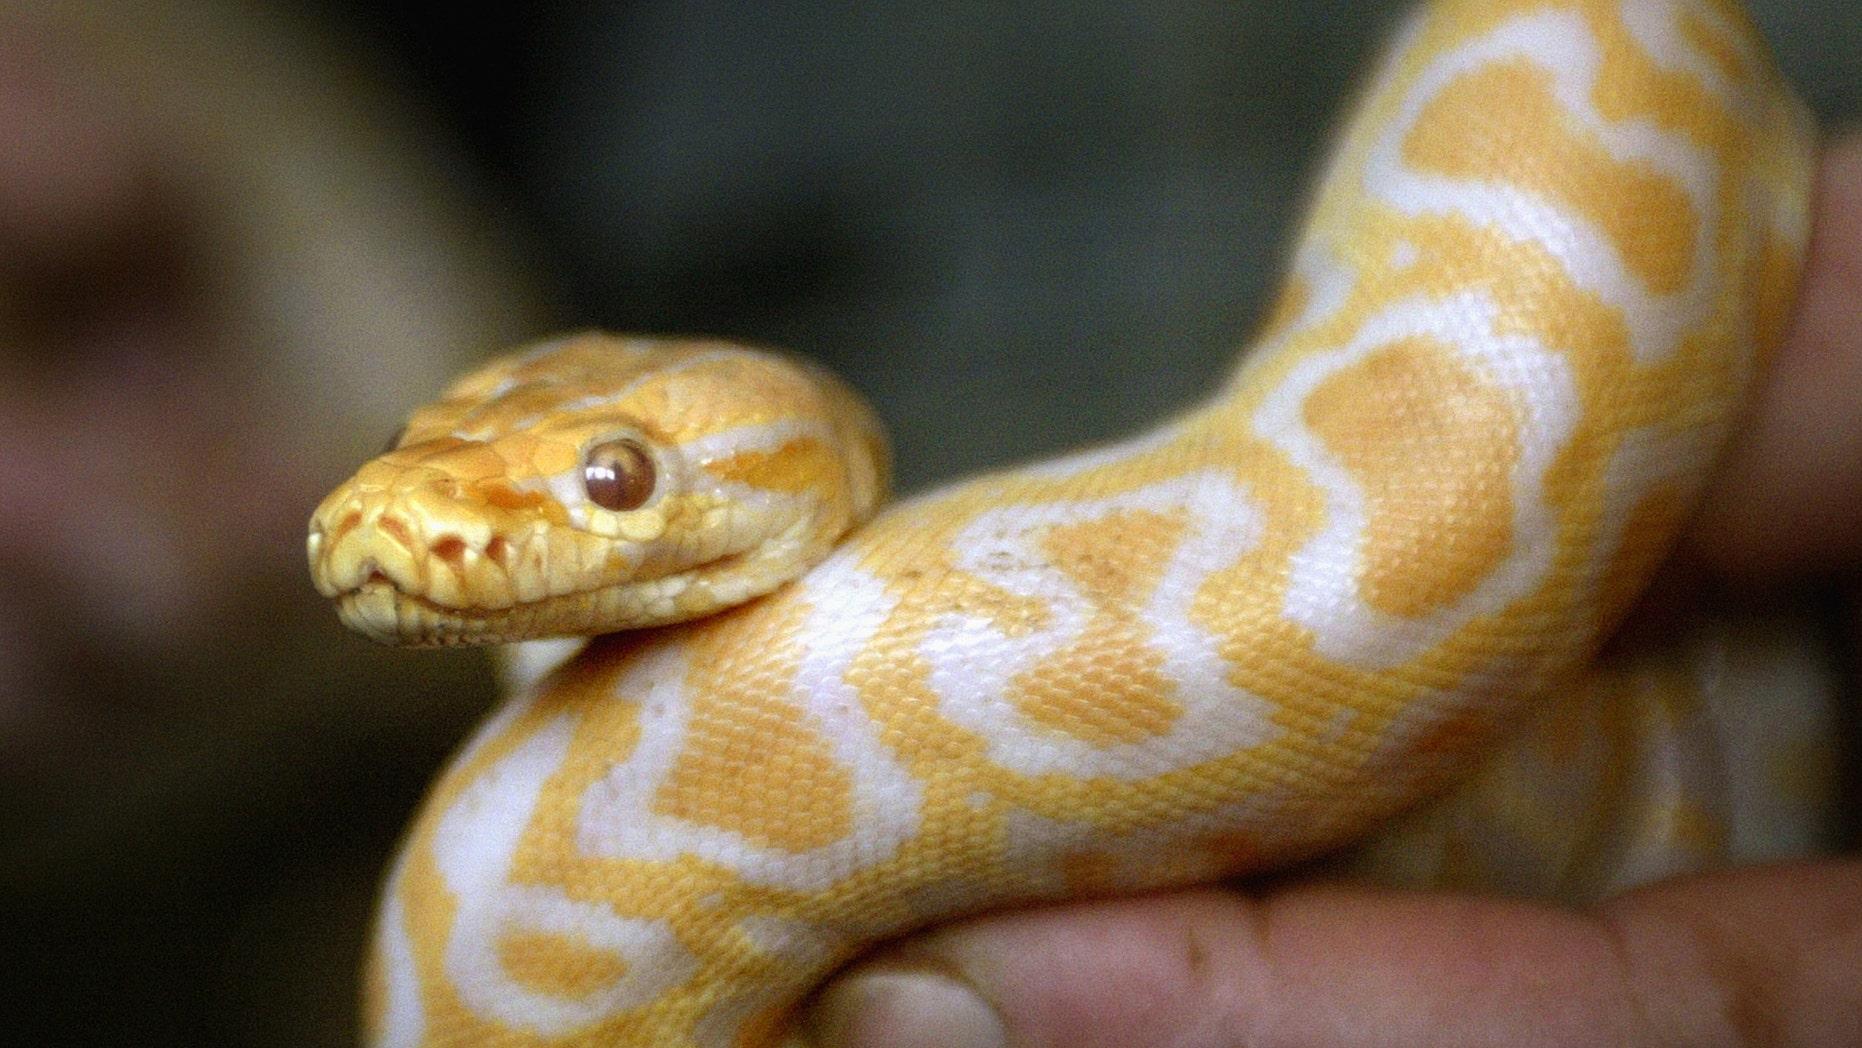 File photo: A Sofia city zoo employee shows one-metre long baby tiger python on January 26, 2004. (REUTERS/Stoyan Nenov)